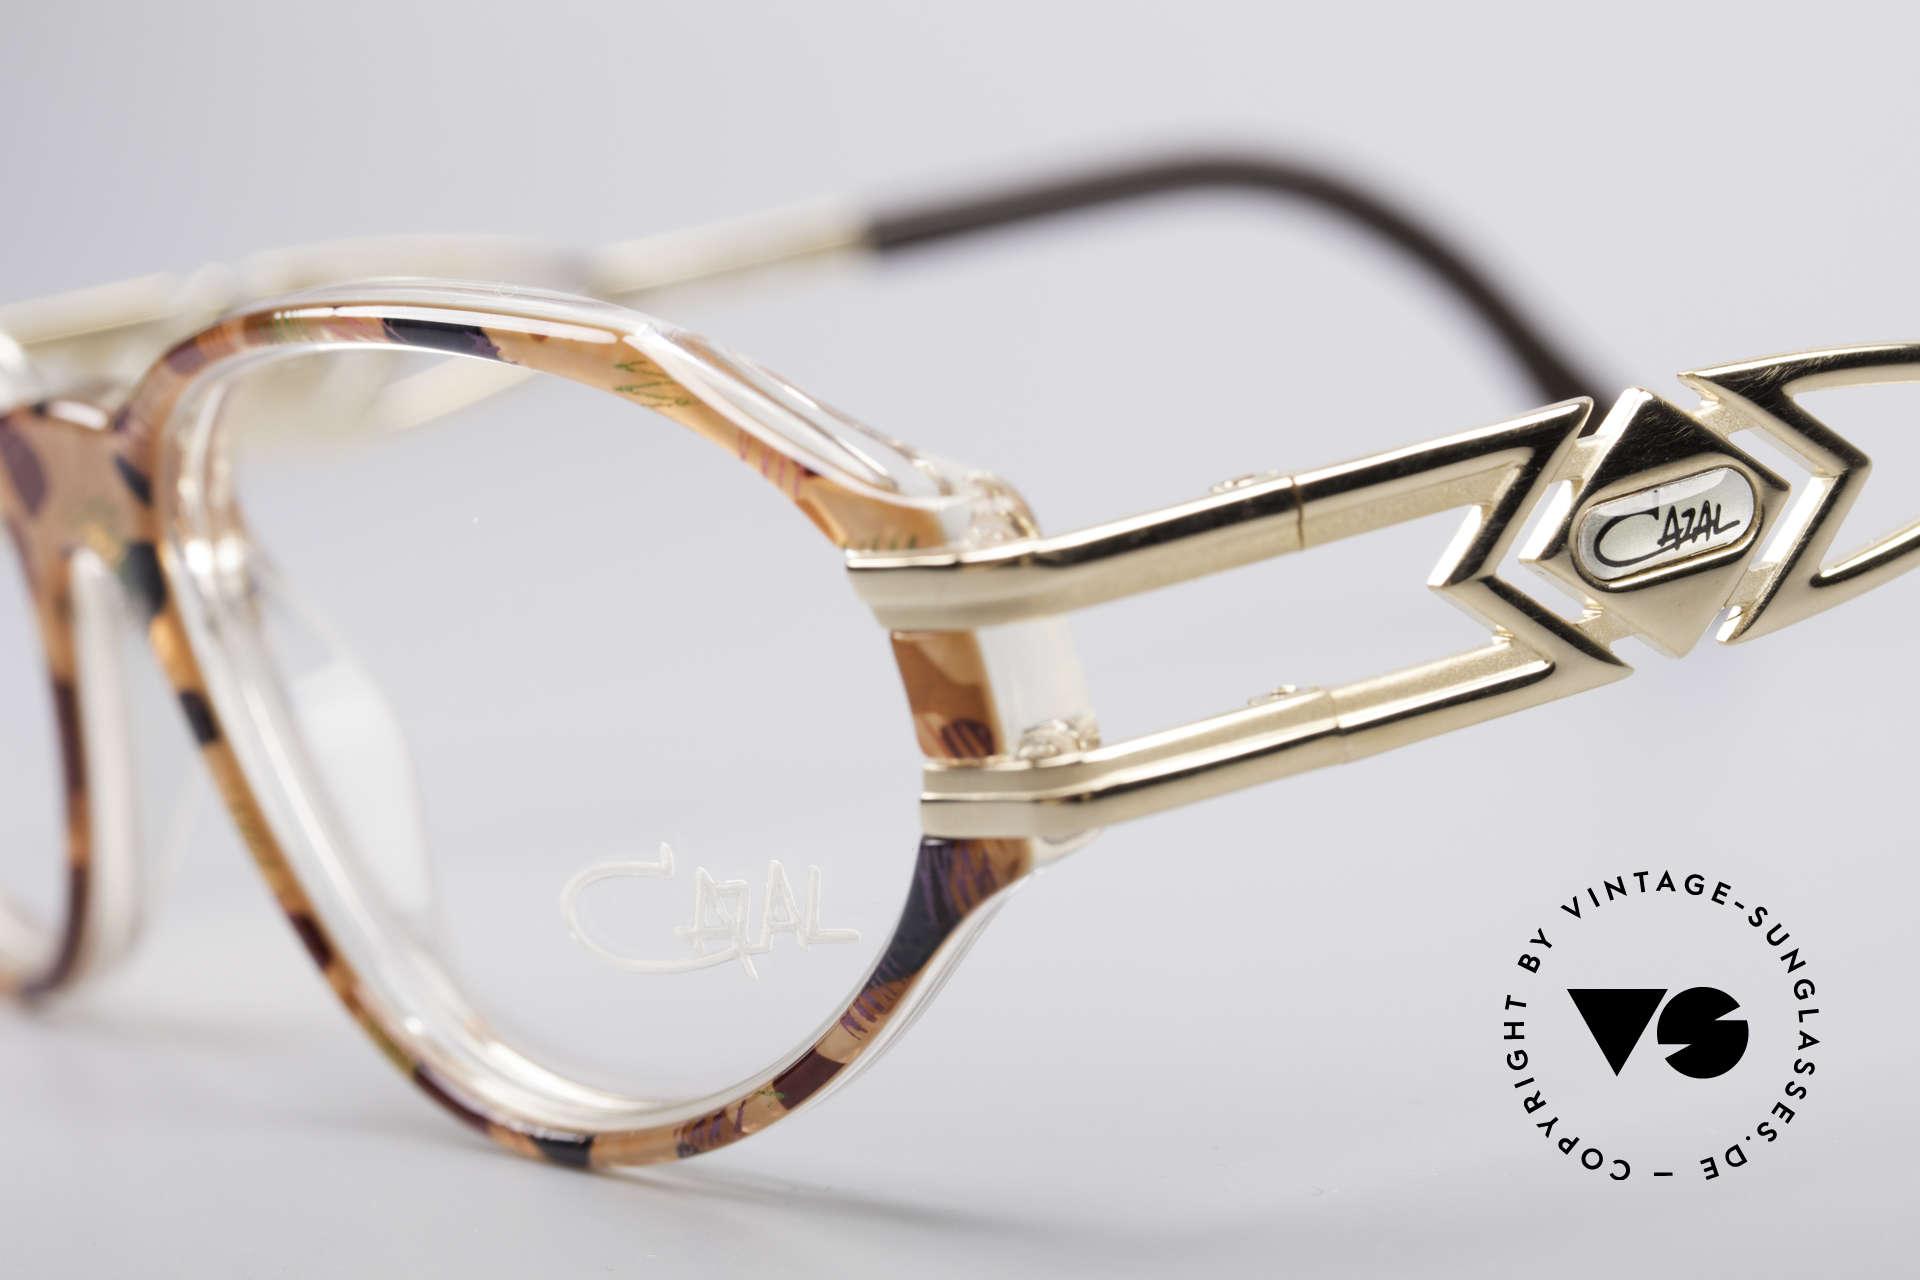 Cazal 356 90's Vintage Designer Frame, never worn (like all of our rare vintage Cazal eyewear), Made for Women